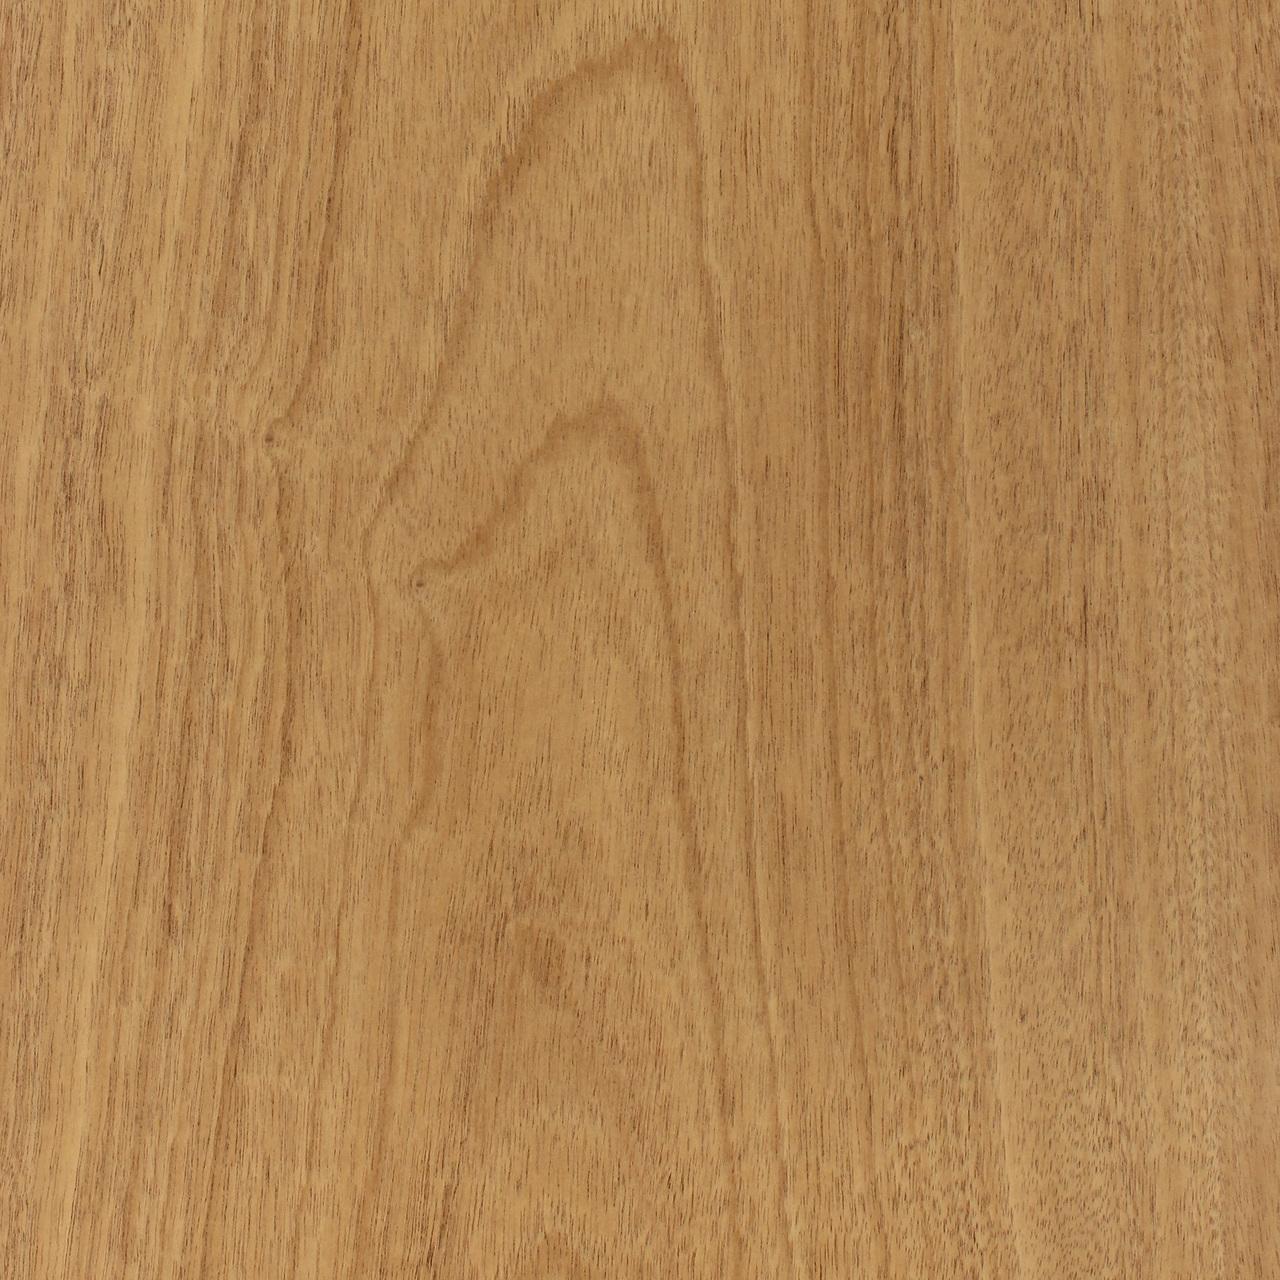 Veneer Wood Products ~ Mahogany veneer sheets deals at outlet